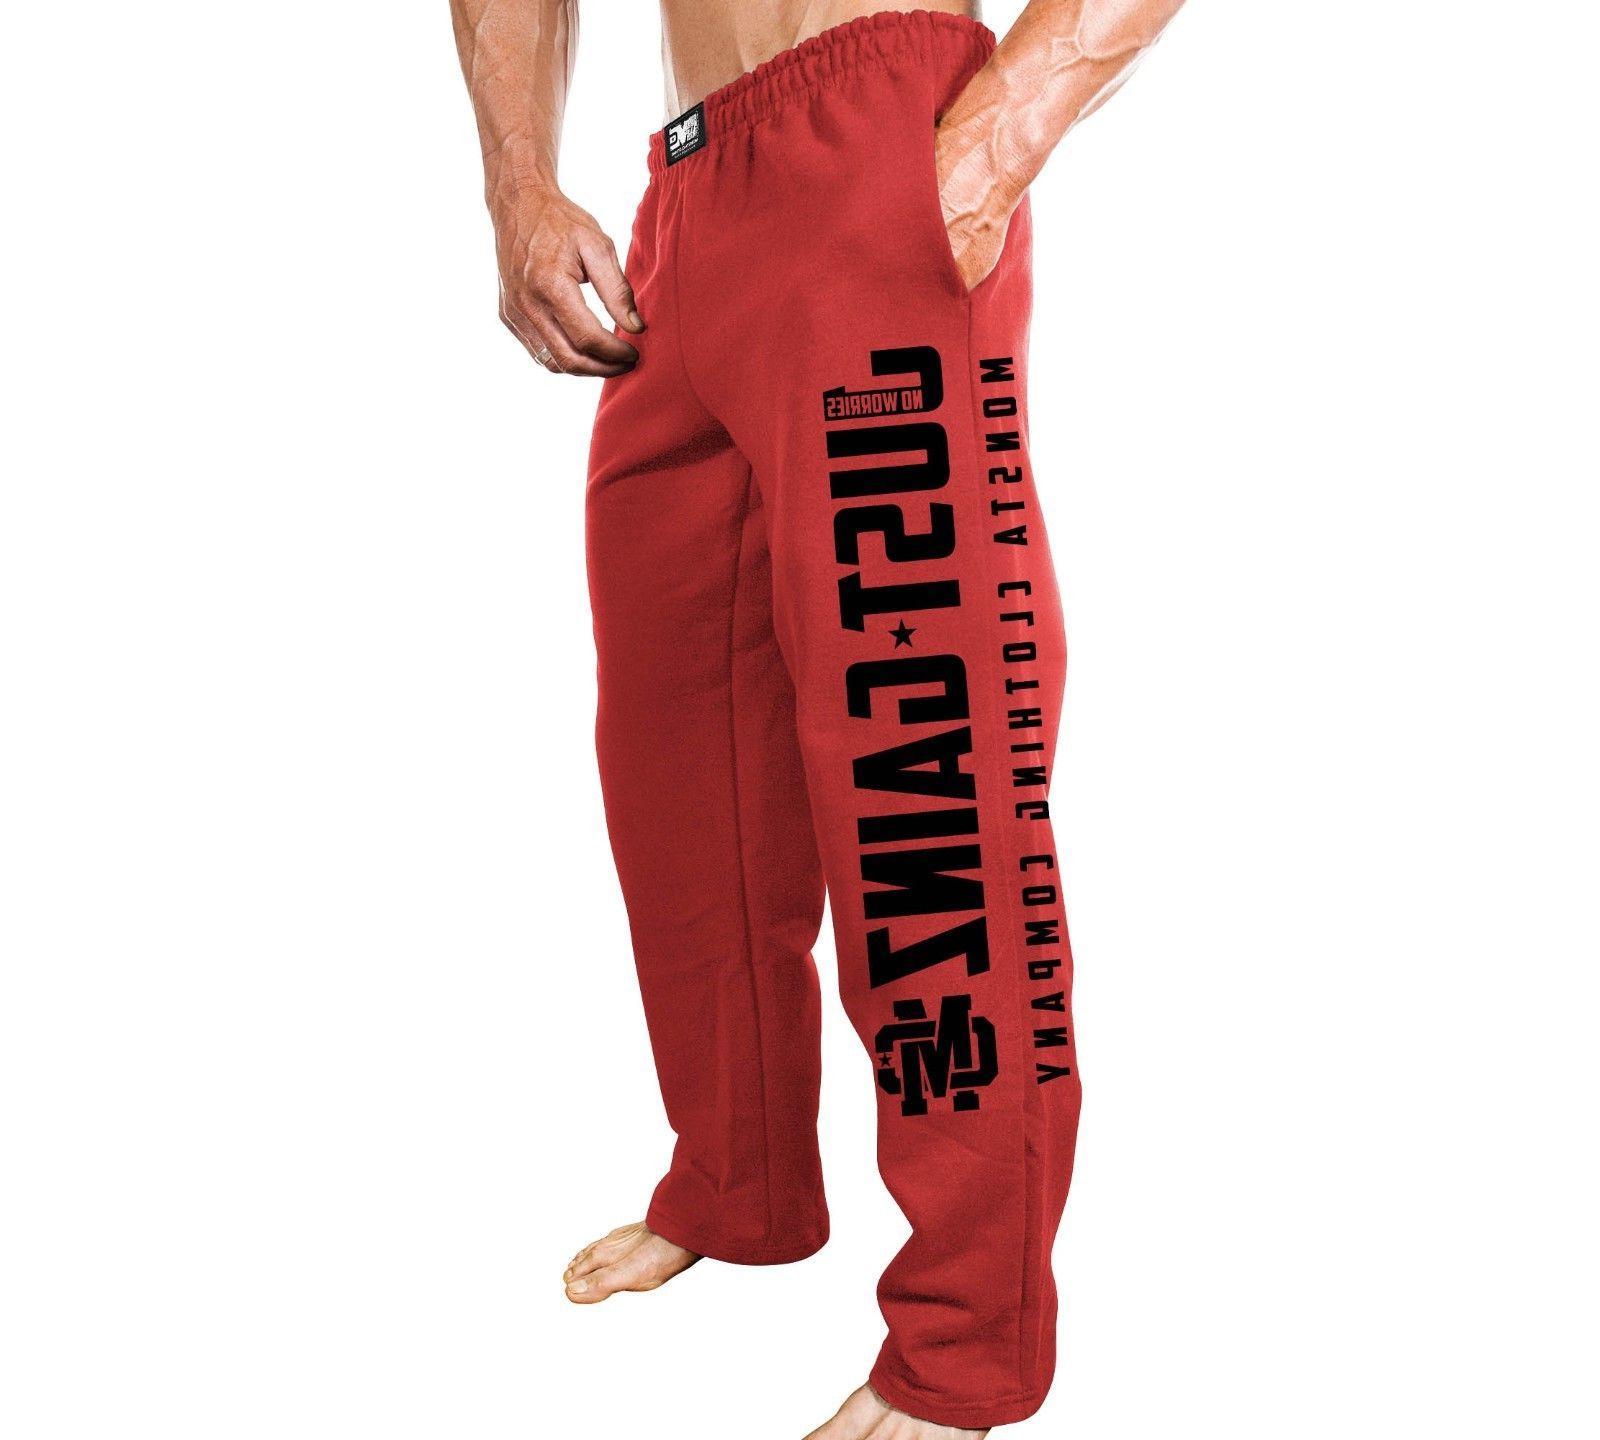 New Men's Fitness Gym Sweatpants Just